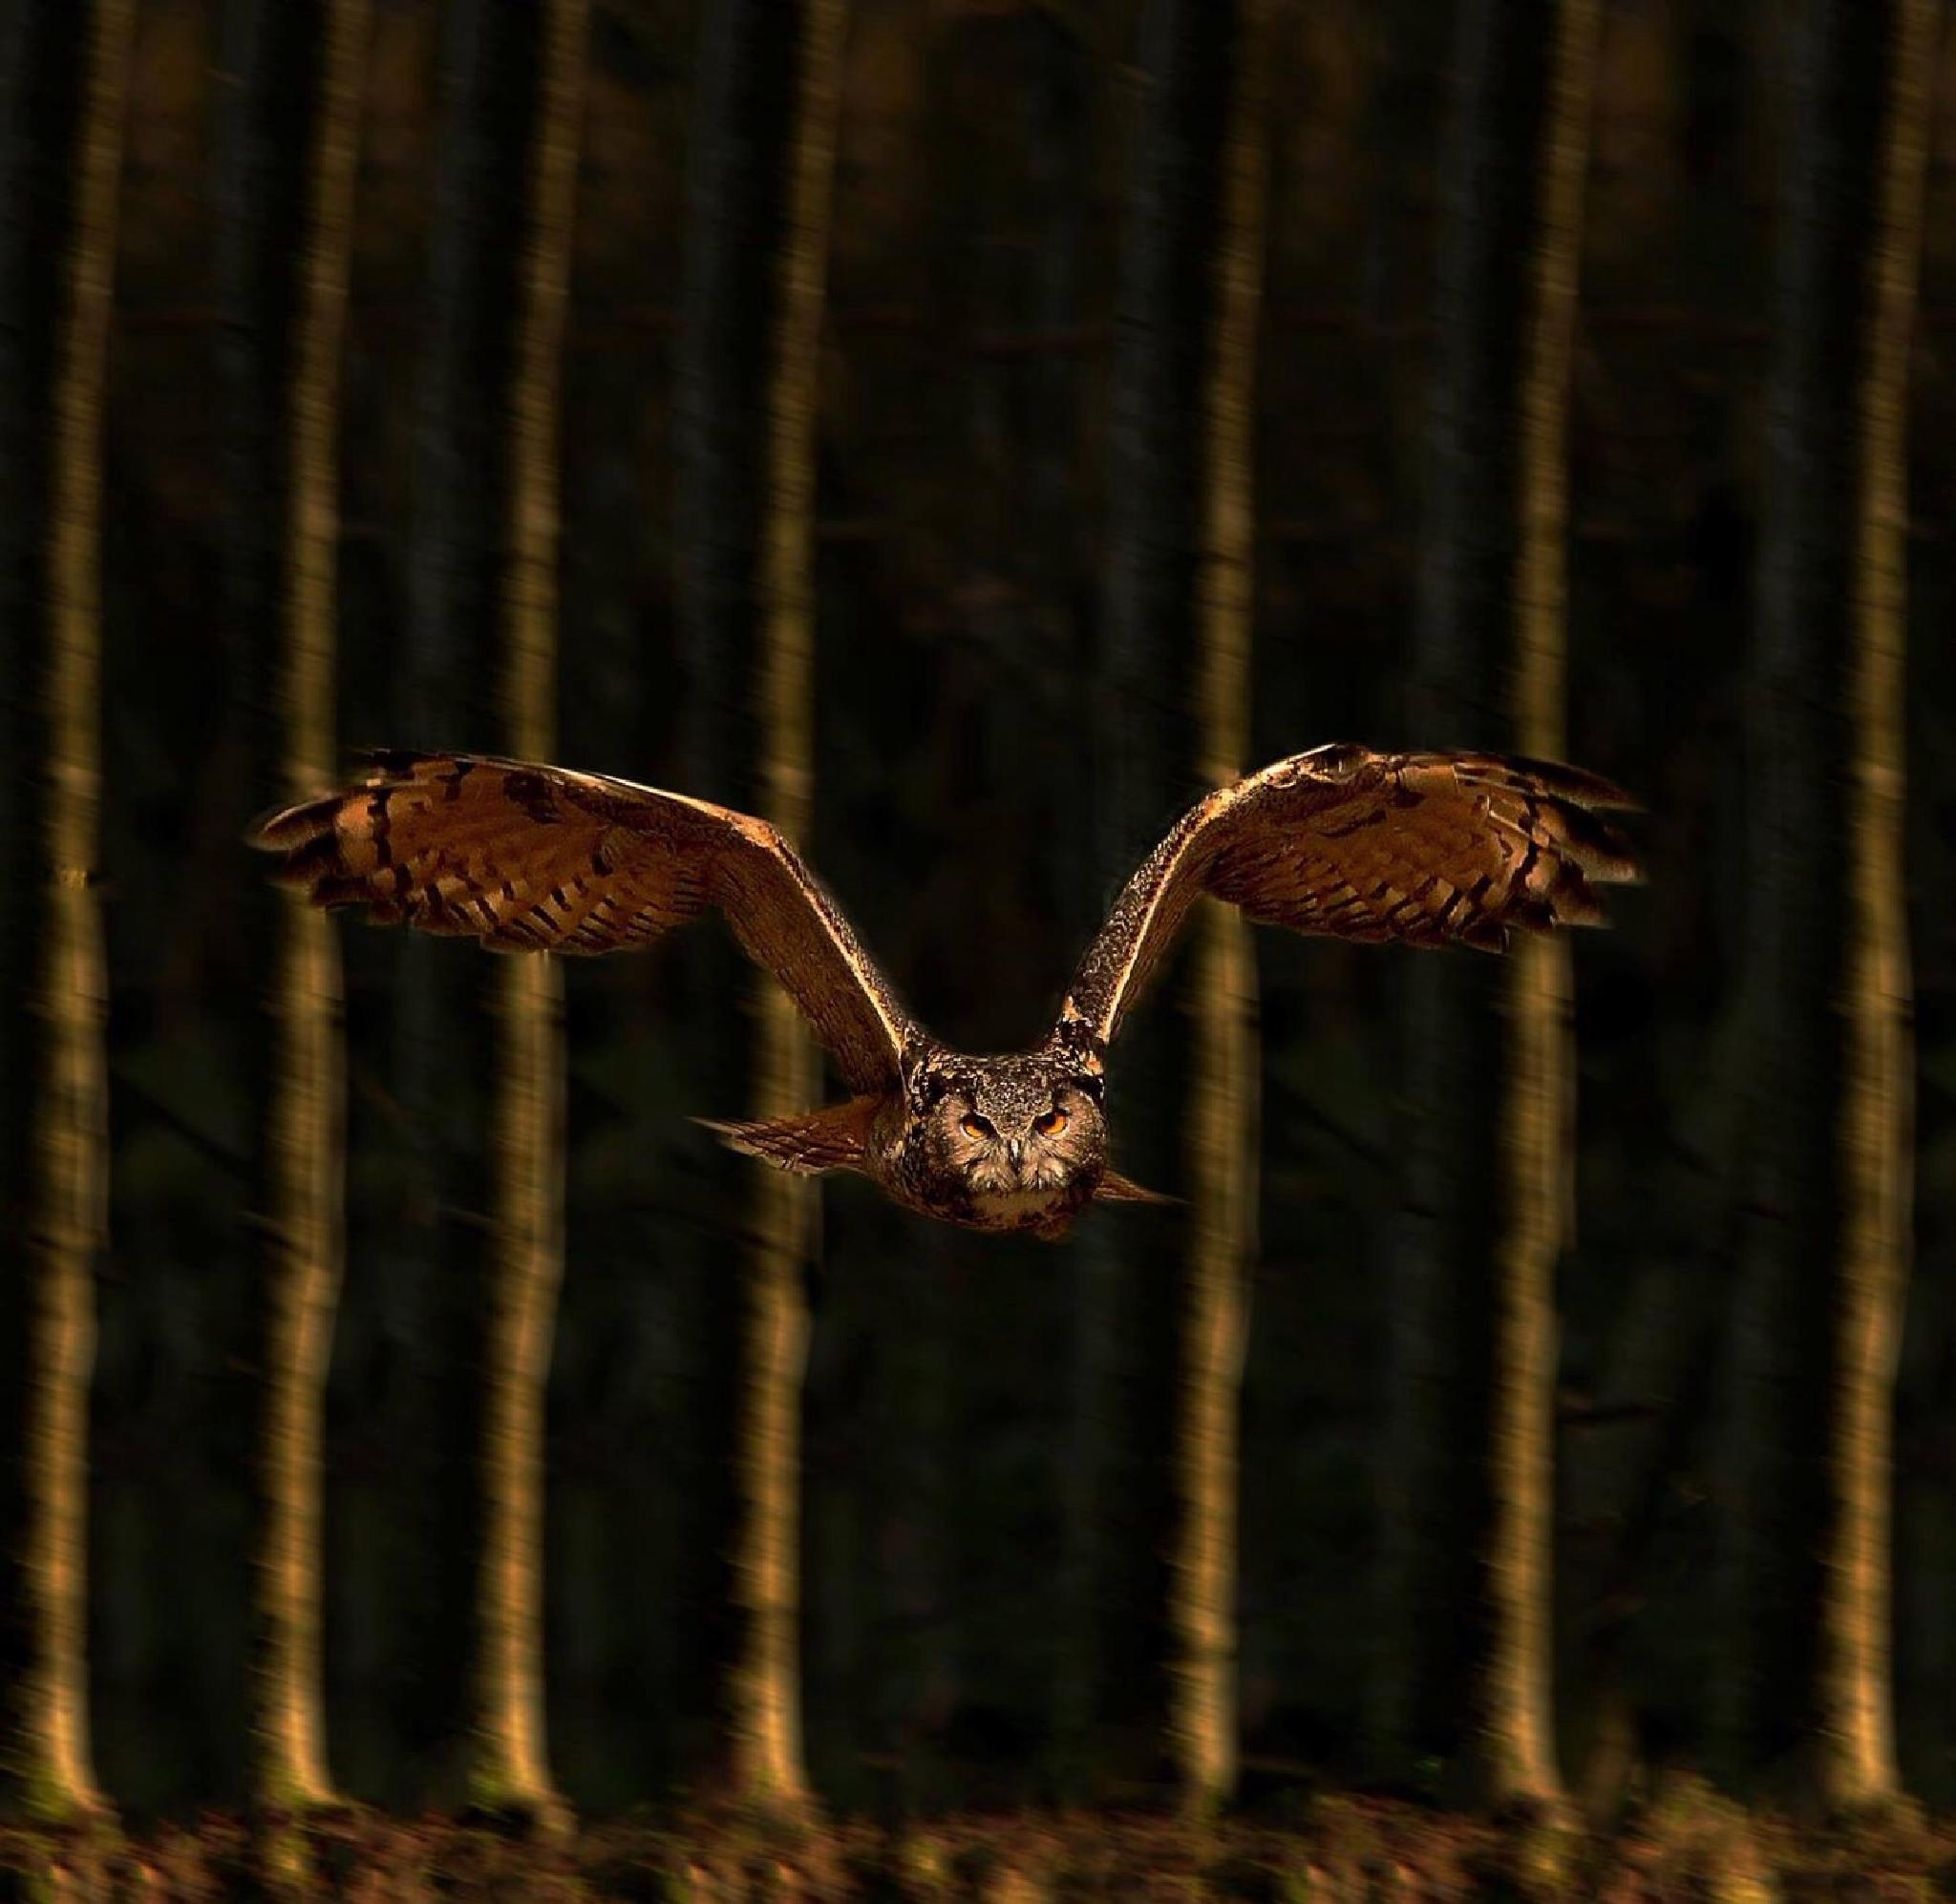 Eagle Owl by Mark Mcelligott